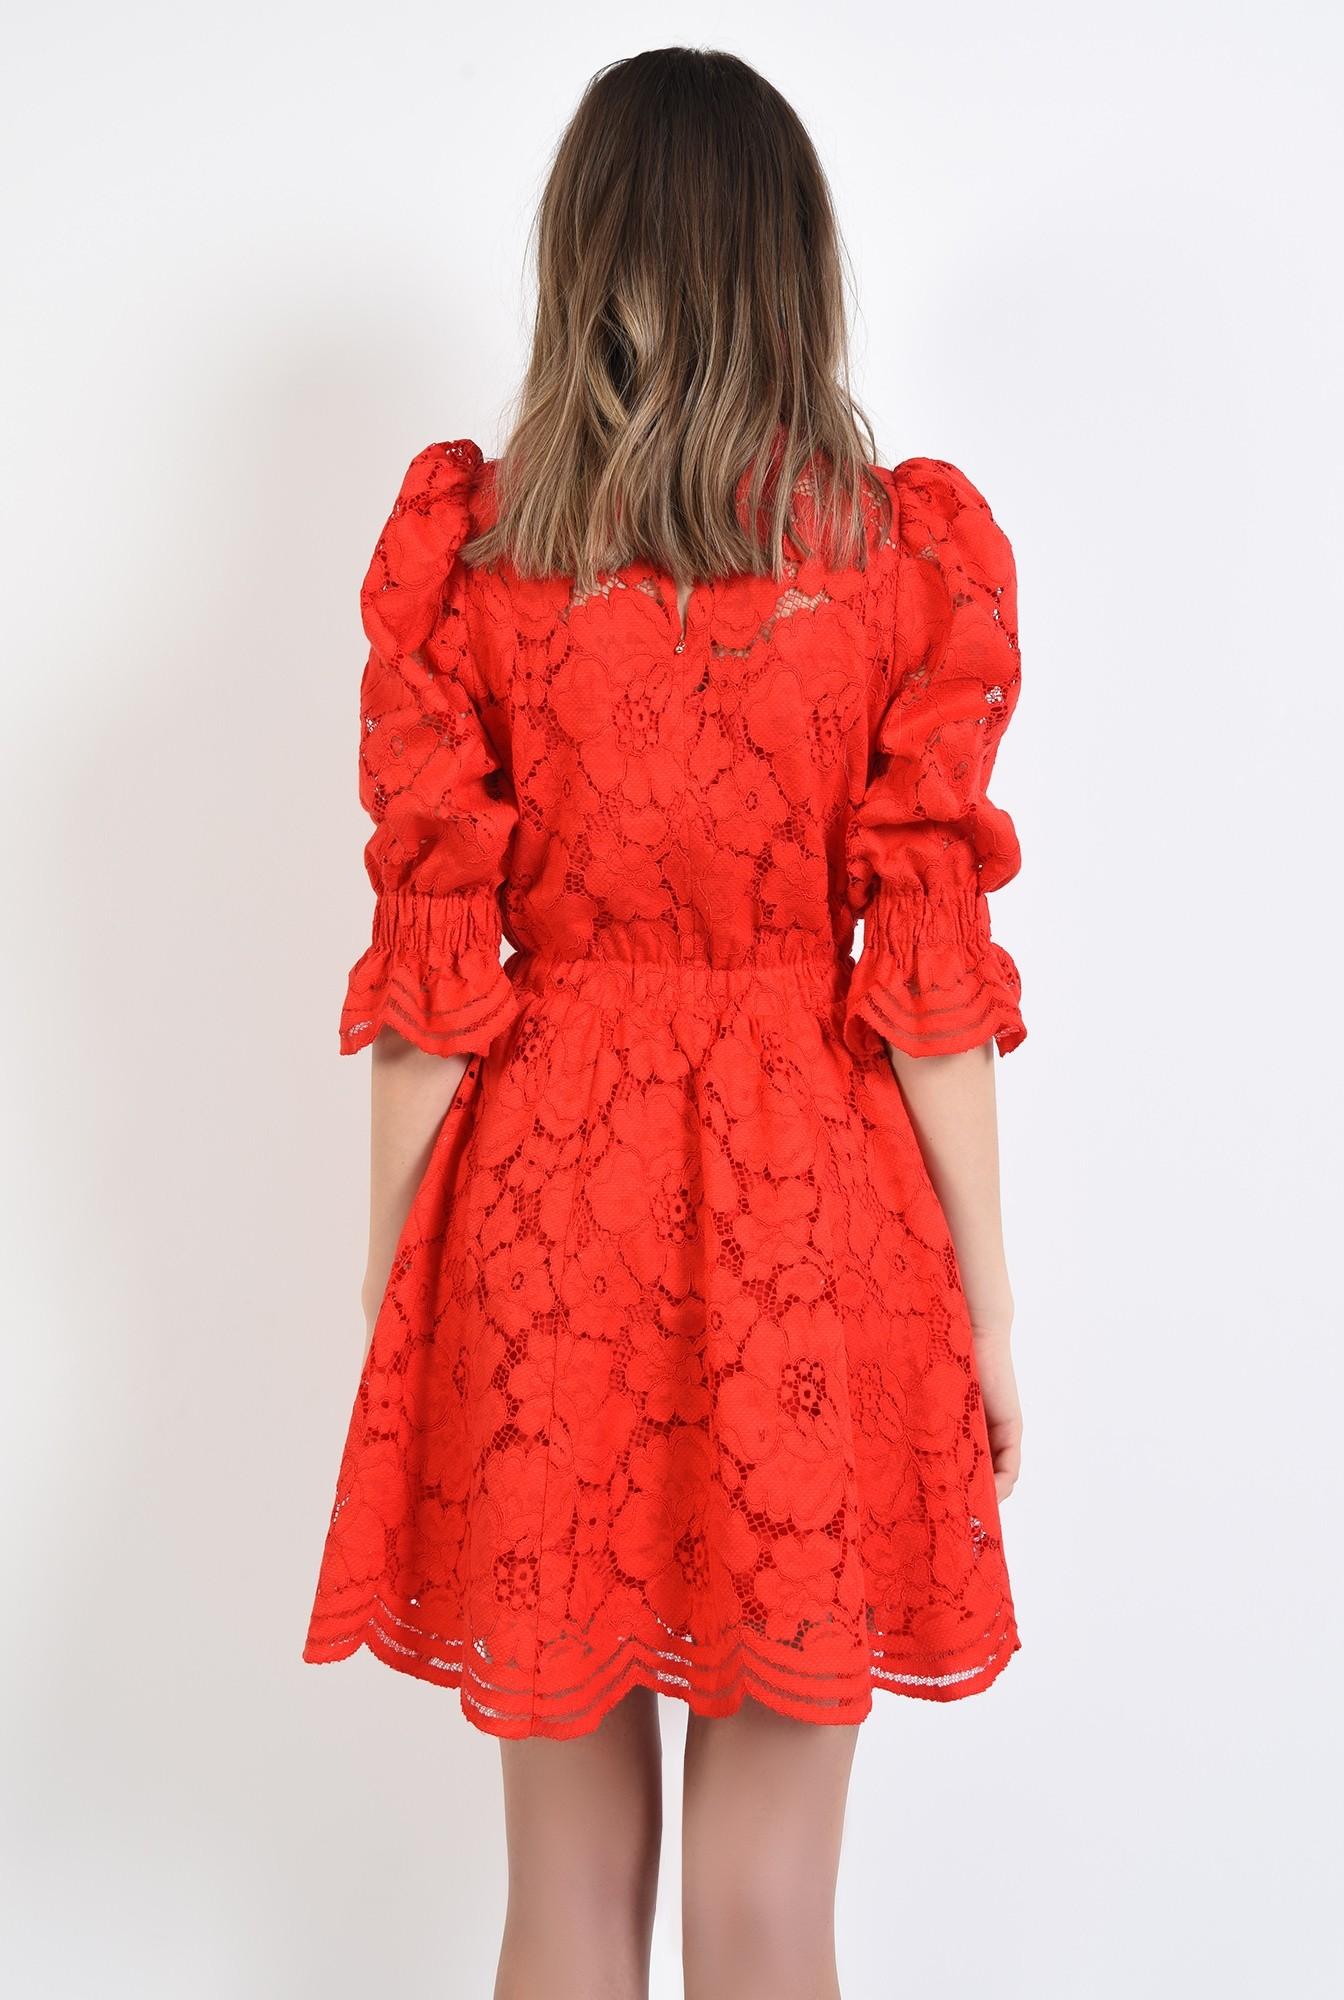 1 - 360 - rochie de ocazie, din dantela, rosie, clos, scurta